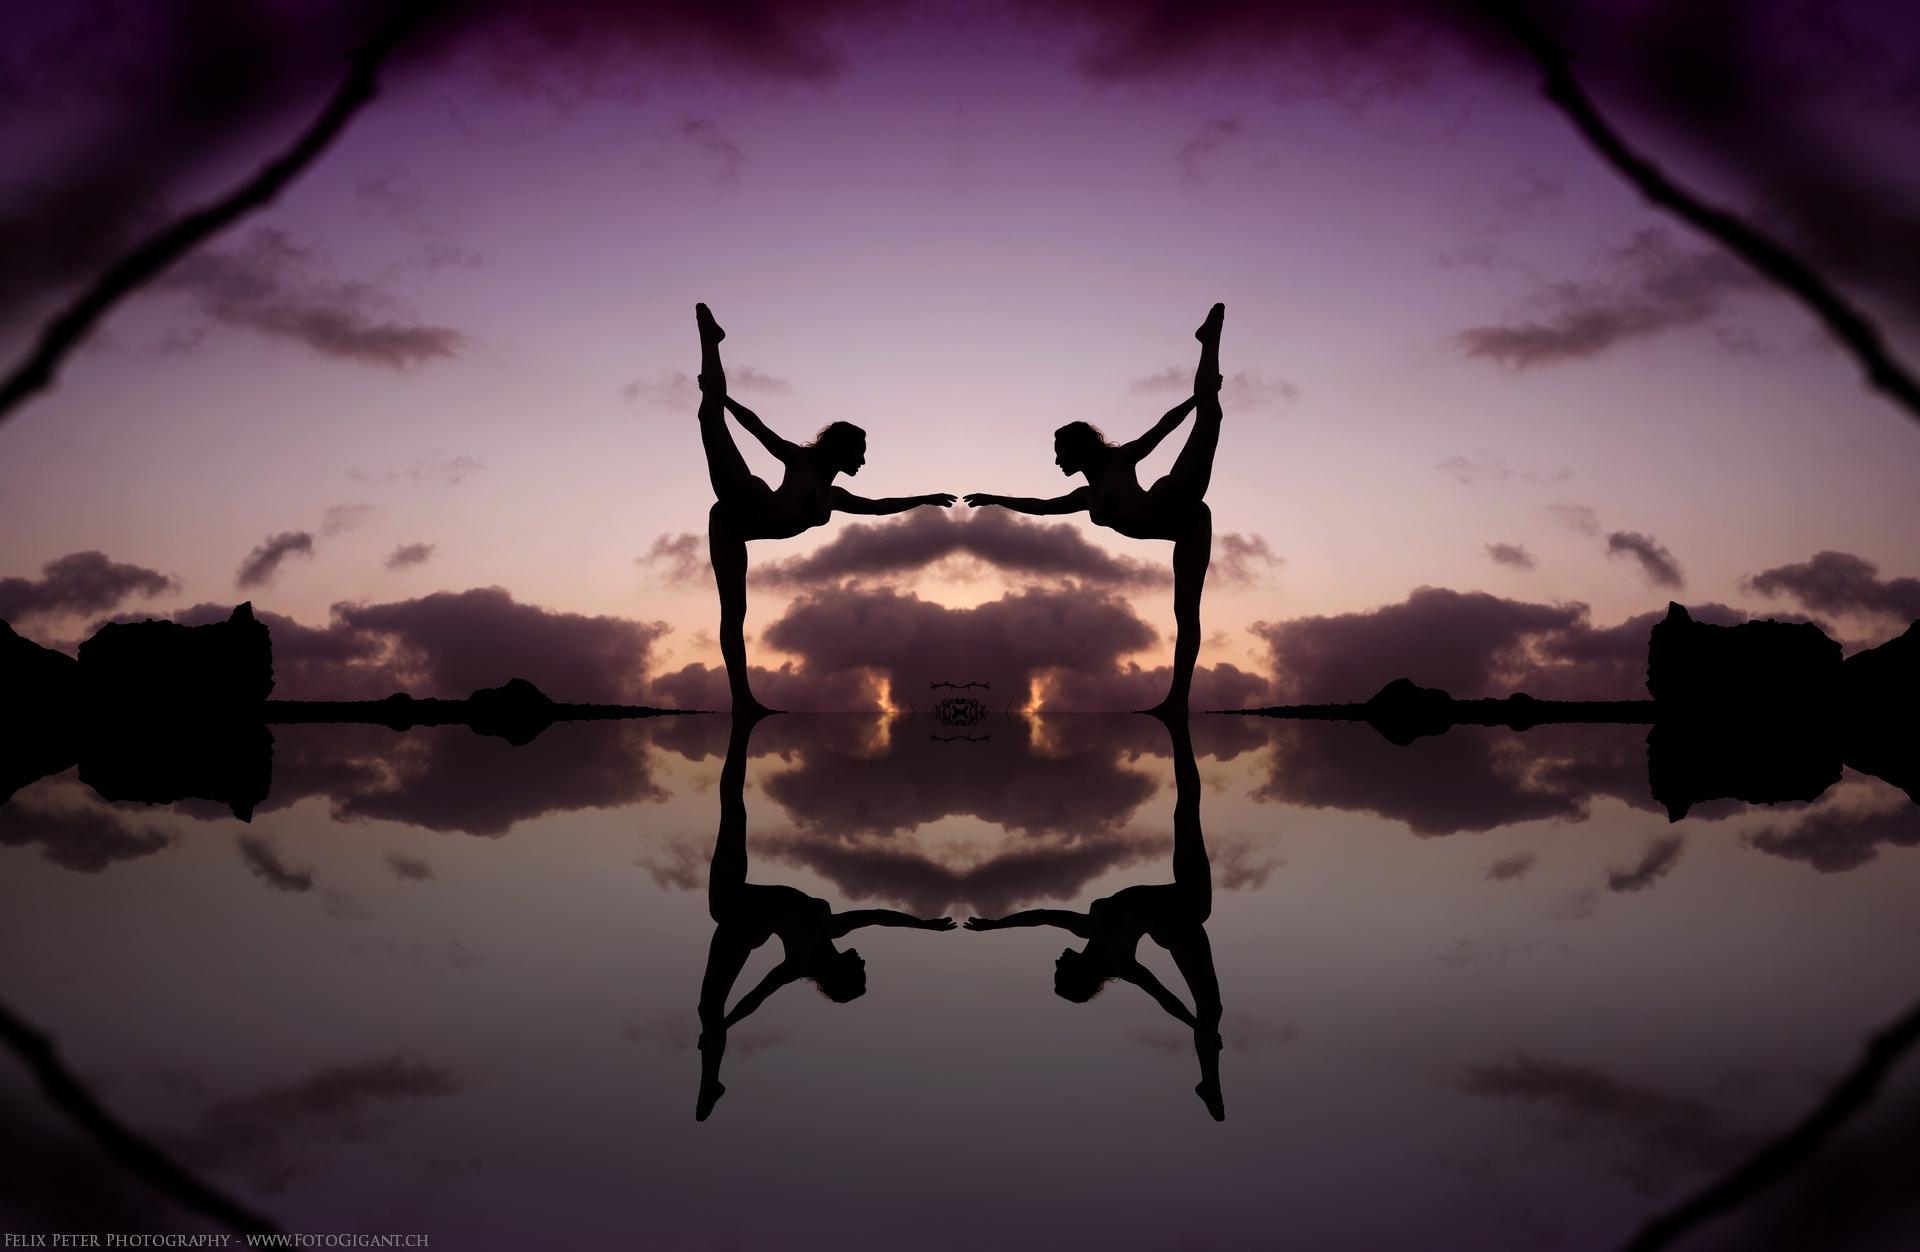 Felix-Peter-Yoga-Pilates-Dance-Fotografie_Bern_092.jpg